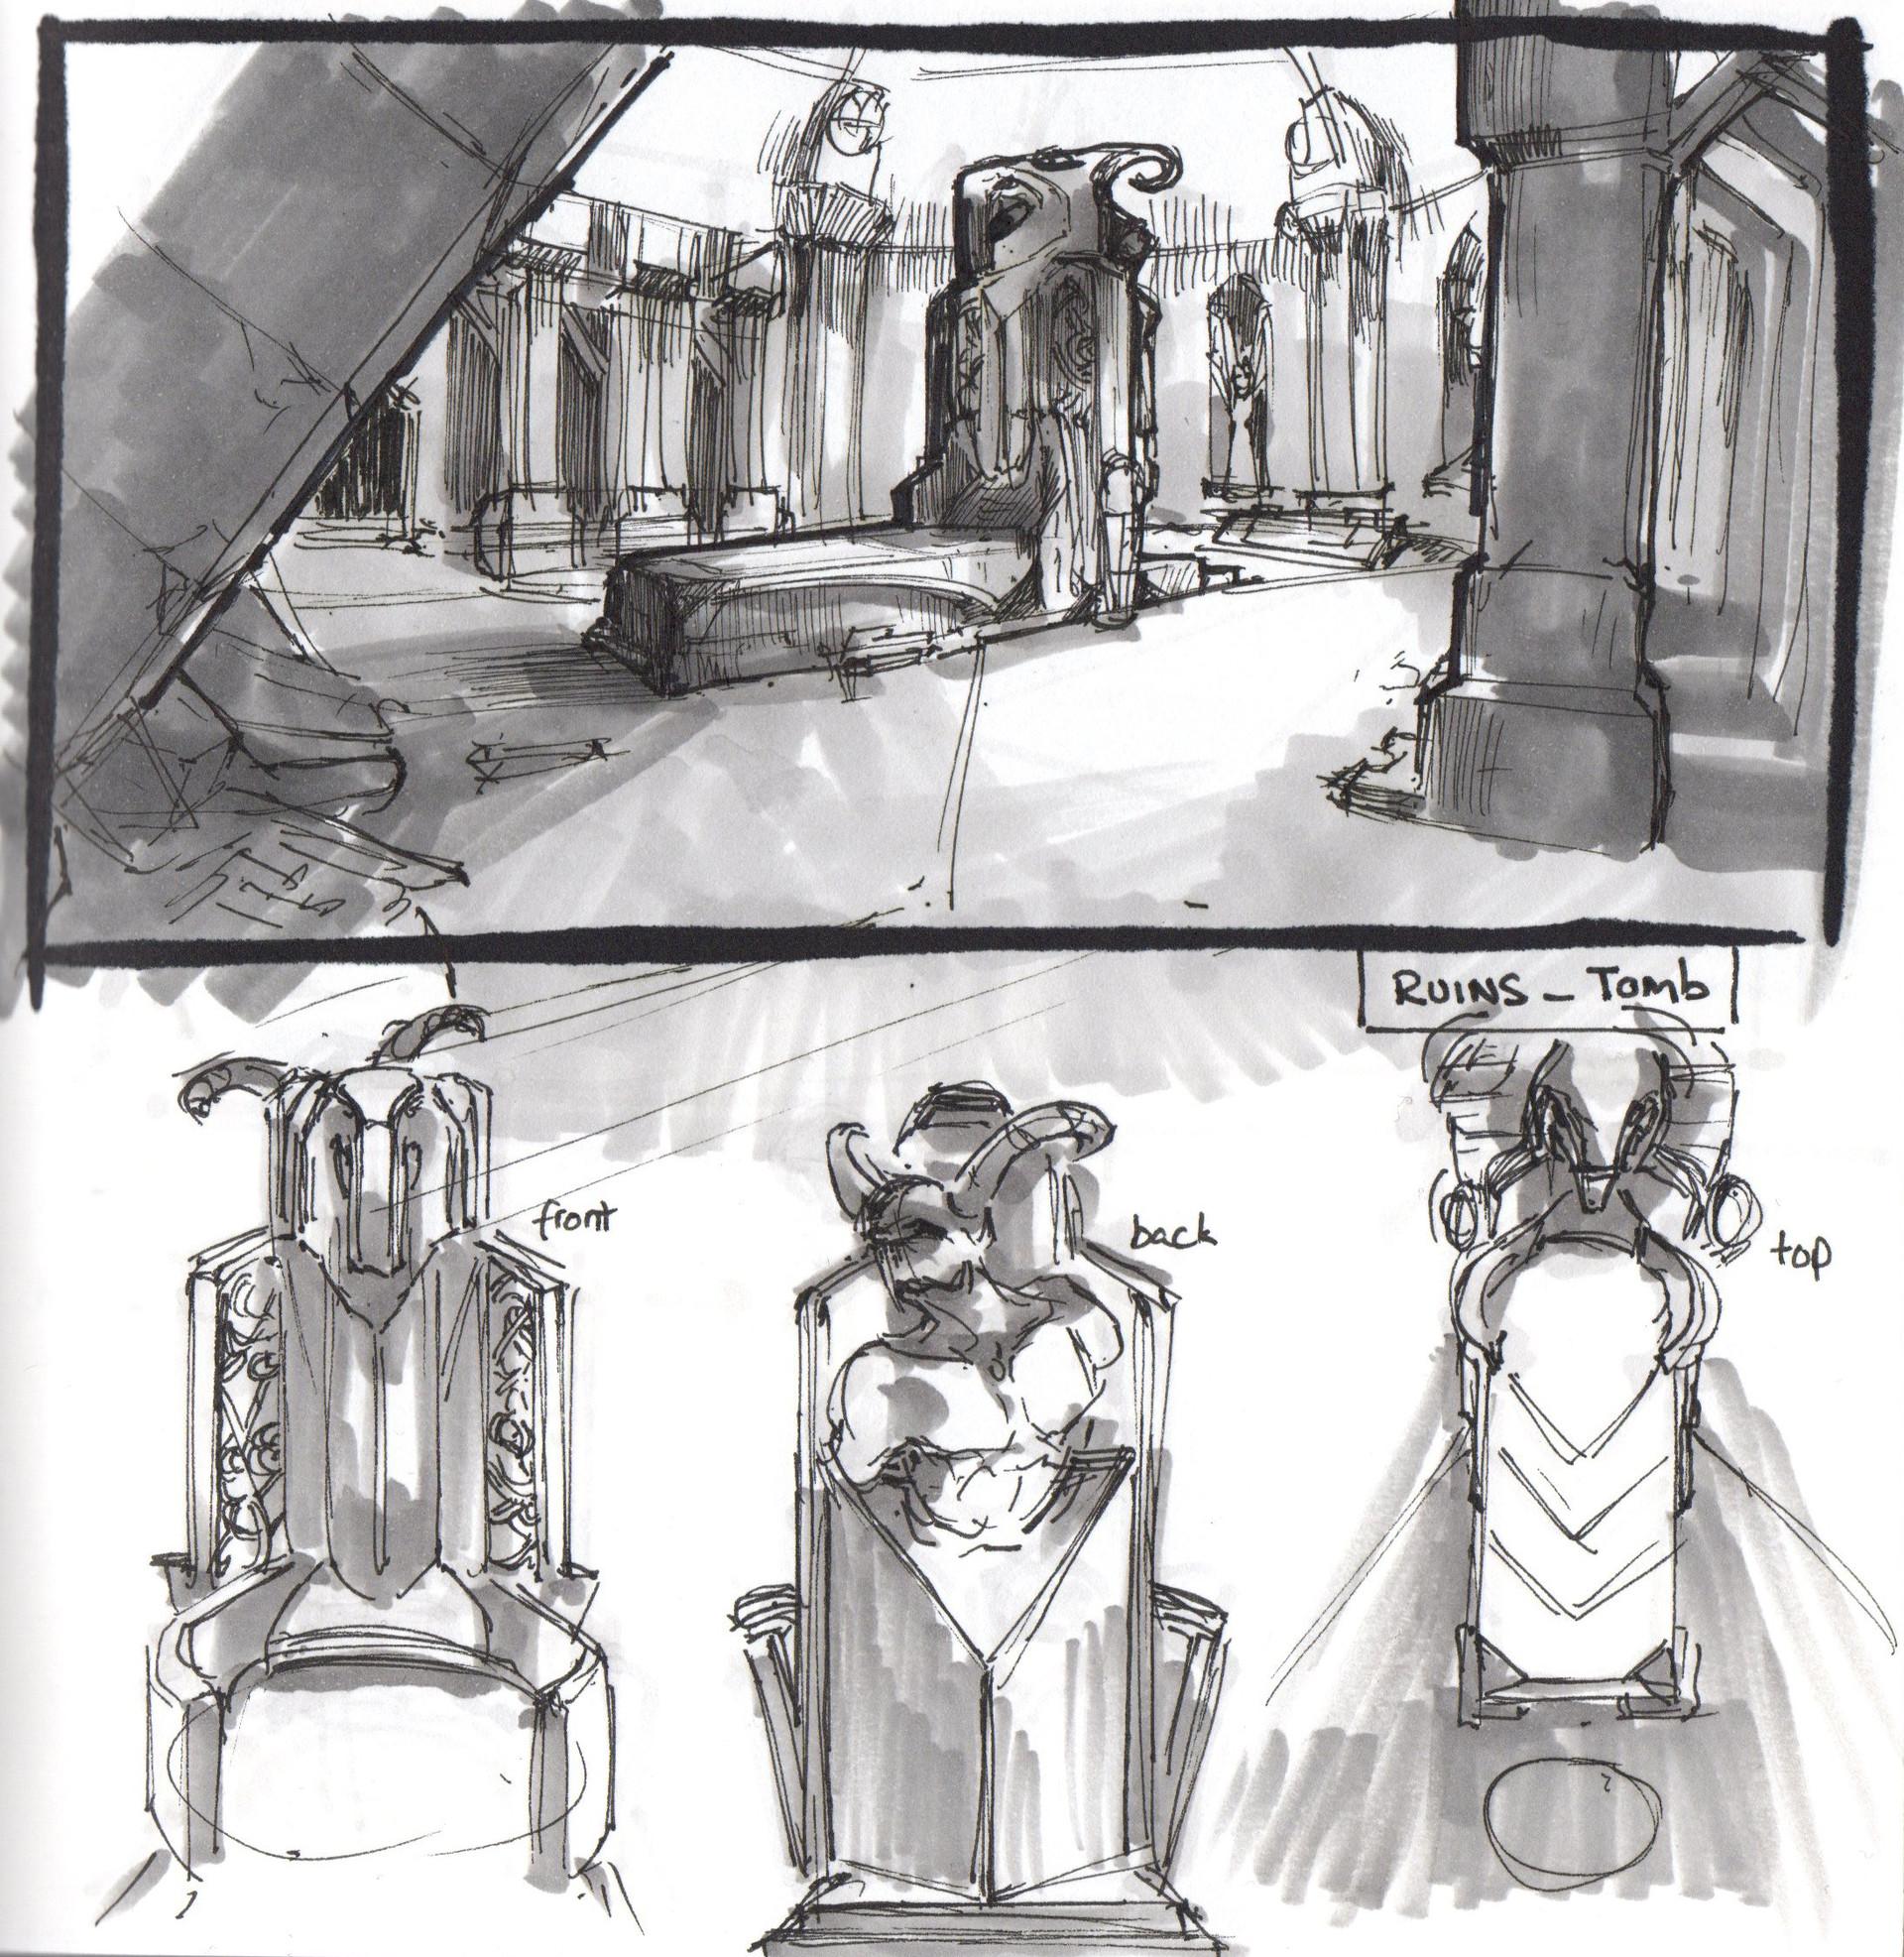 Tombs_ Ruins